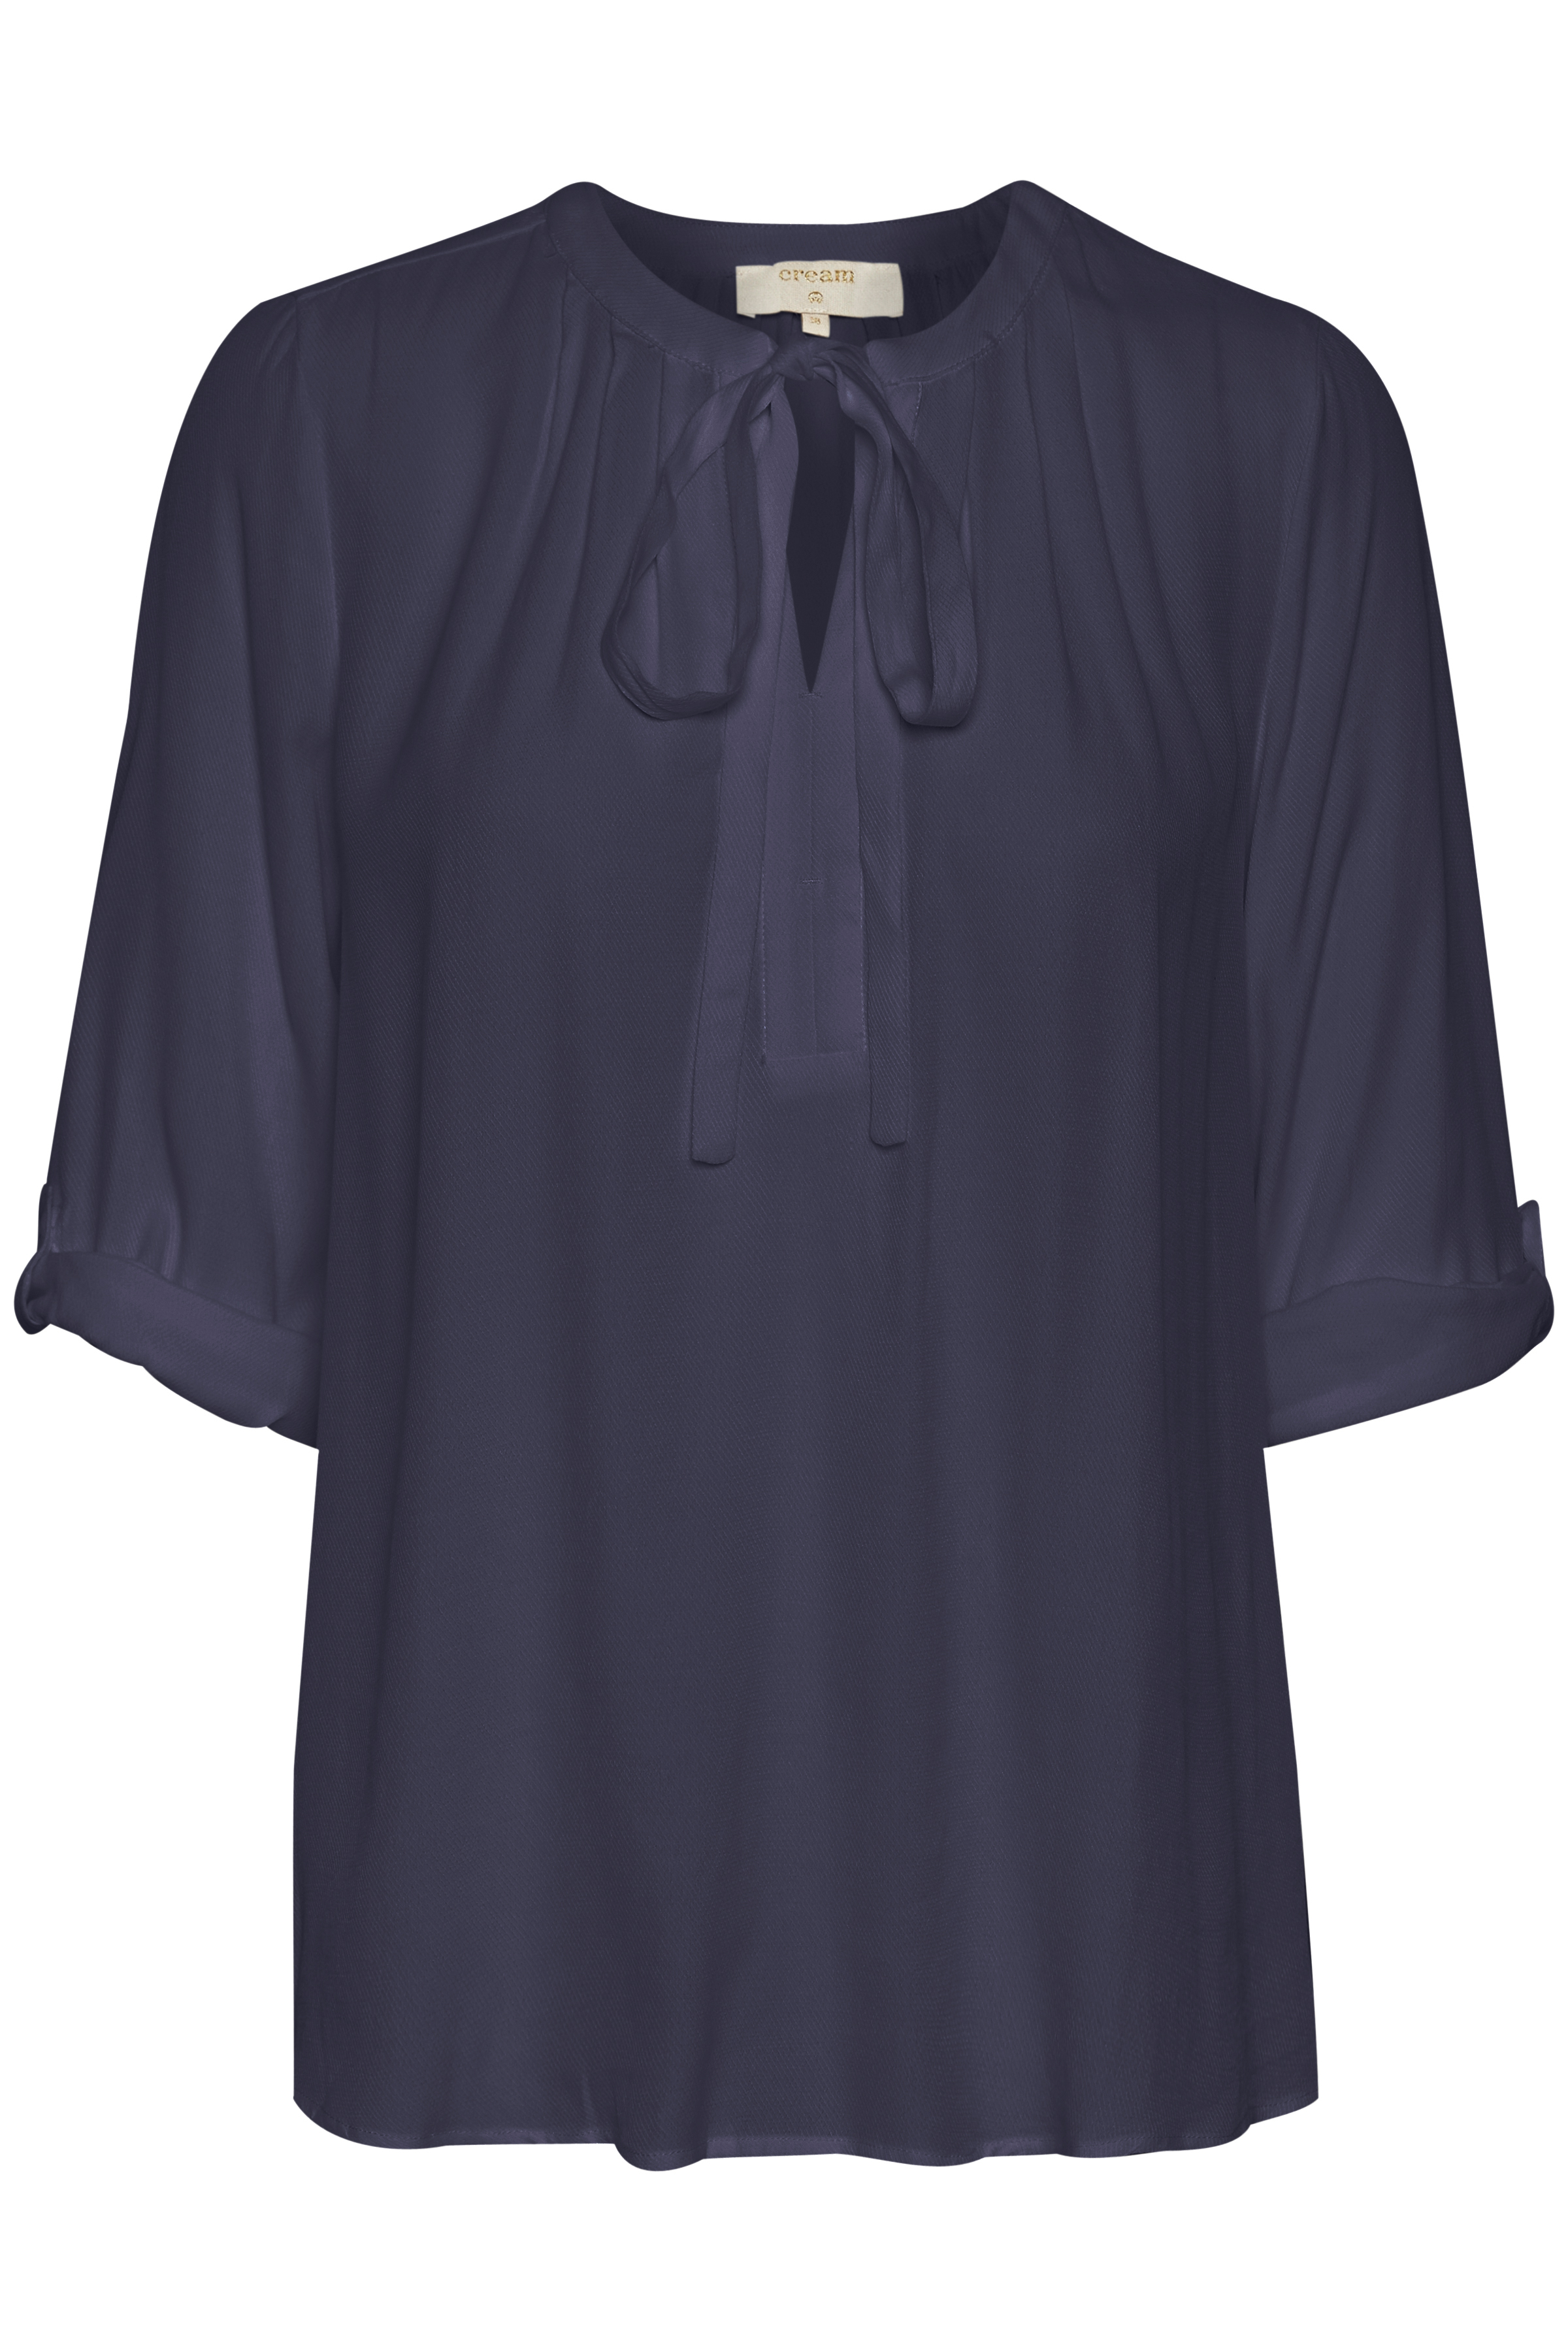 Image of Cream Dame Kortærmet bluse - Marineblå